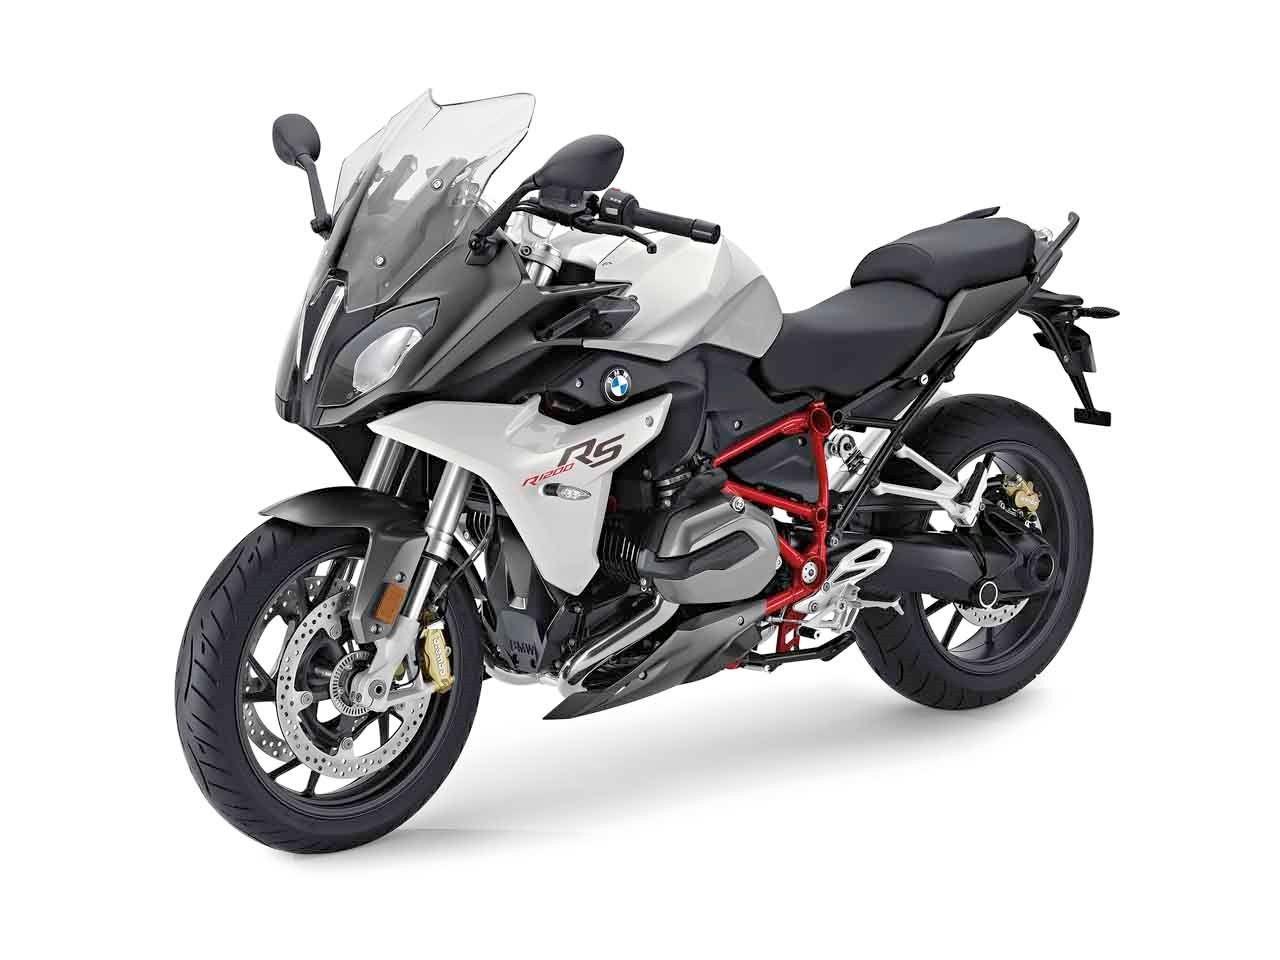 moto neuve acheter bmw r 1200 rs abs arrigoni sport gmbh. Black Bedroom Furniture Sets. Home Design Ideas